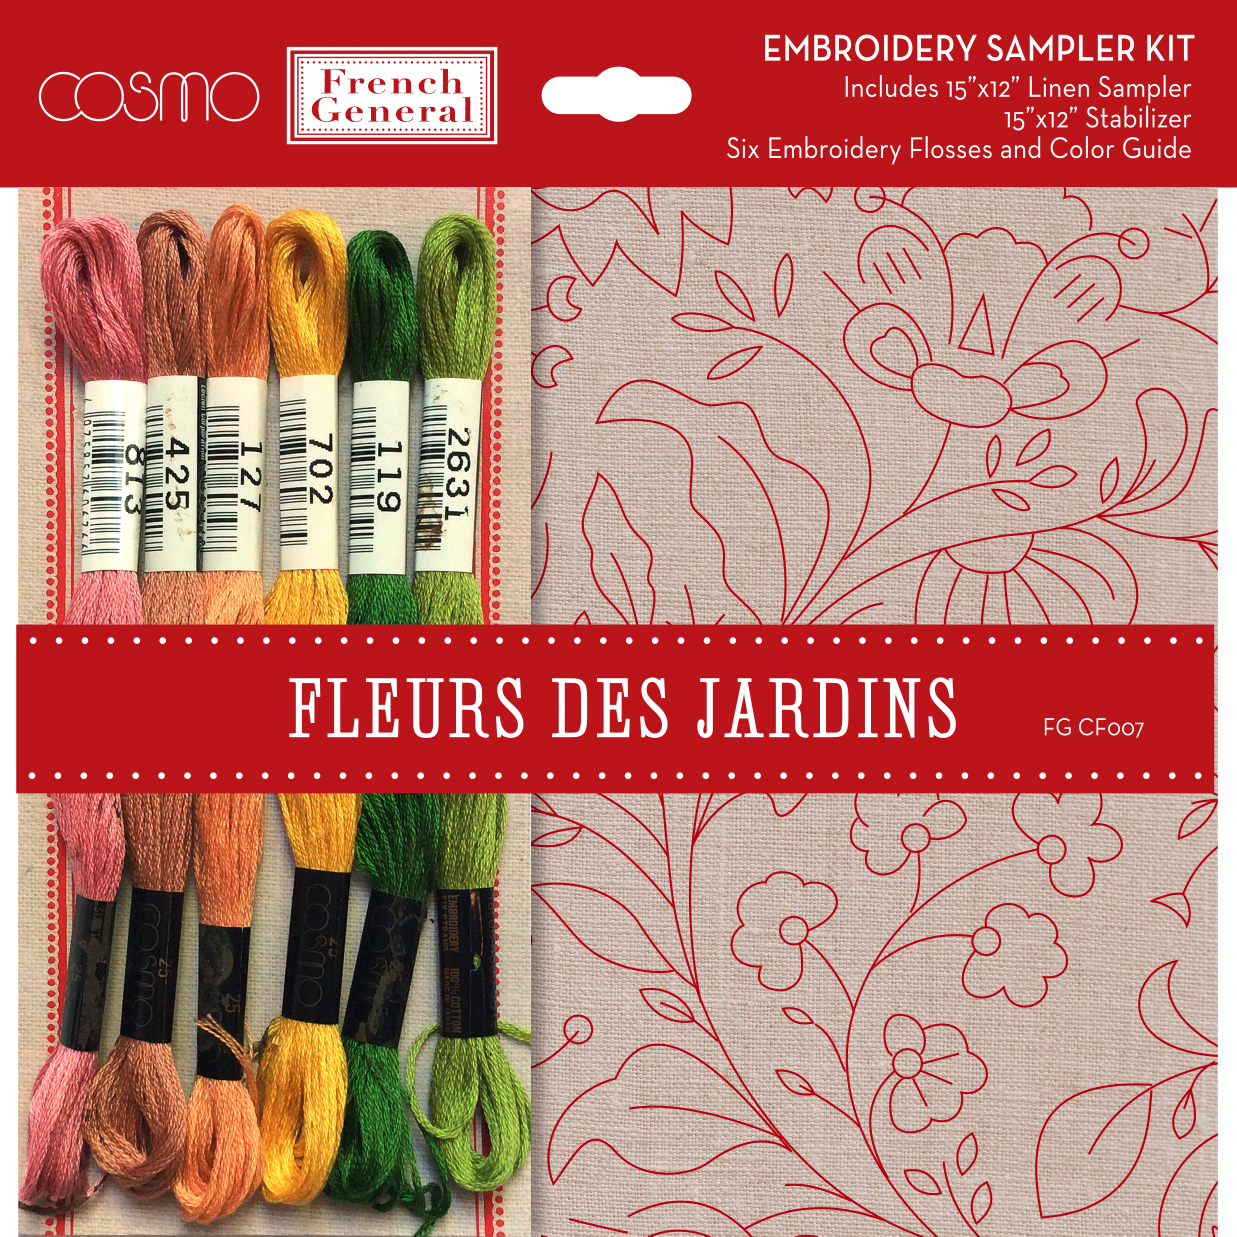 Fleurs De Jardins 15 x 12 kit FG CF 007